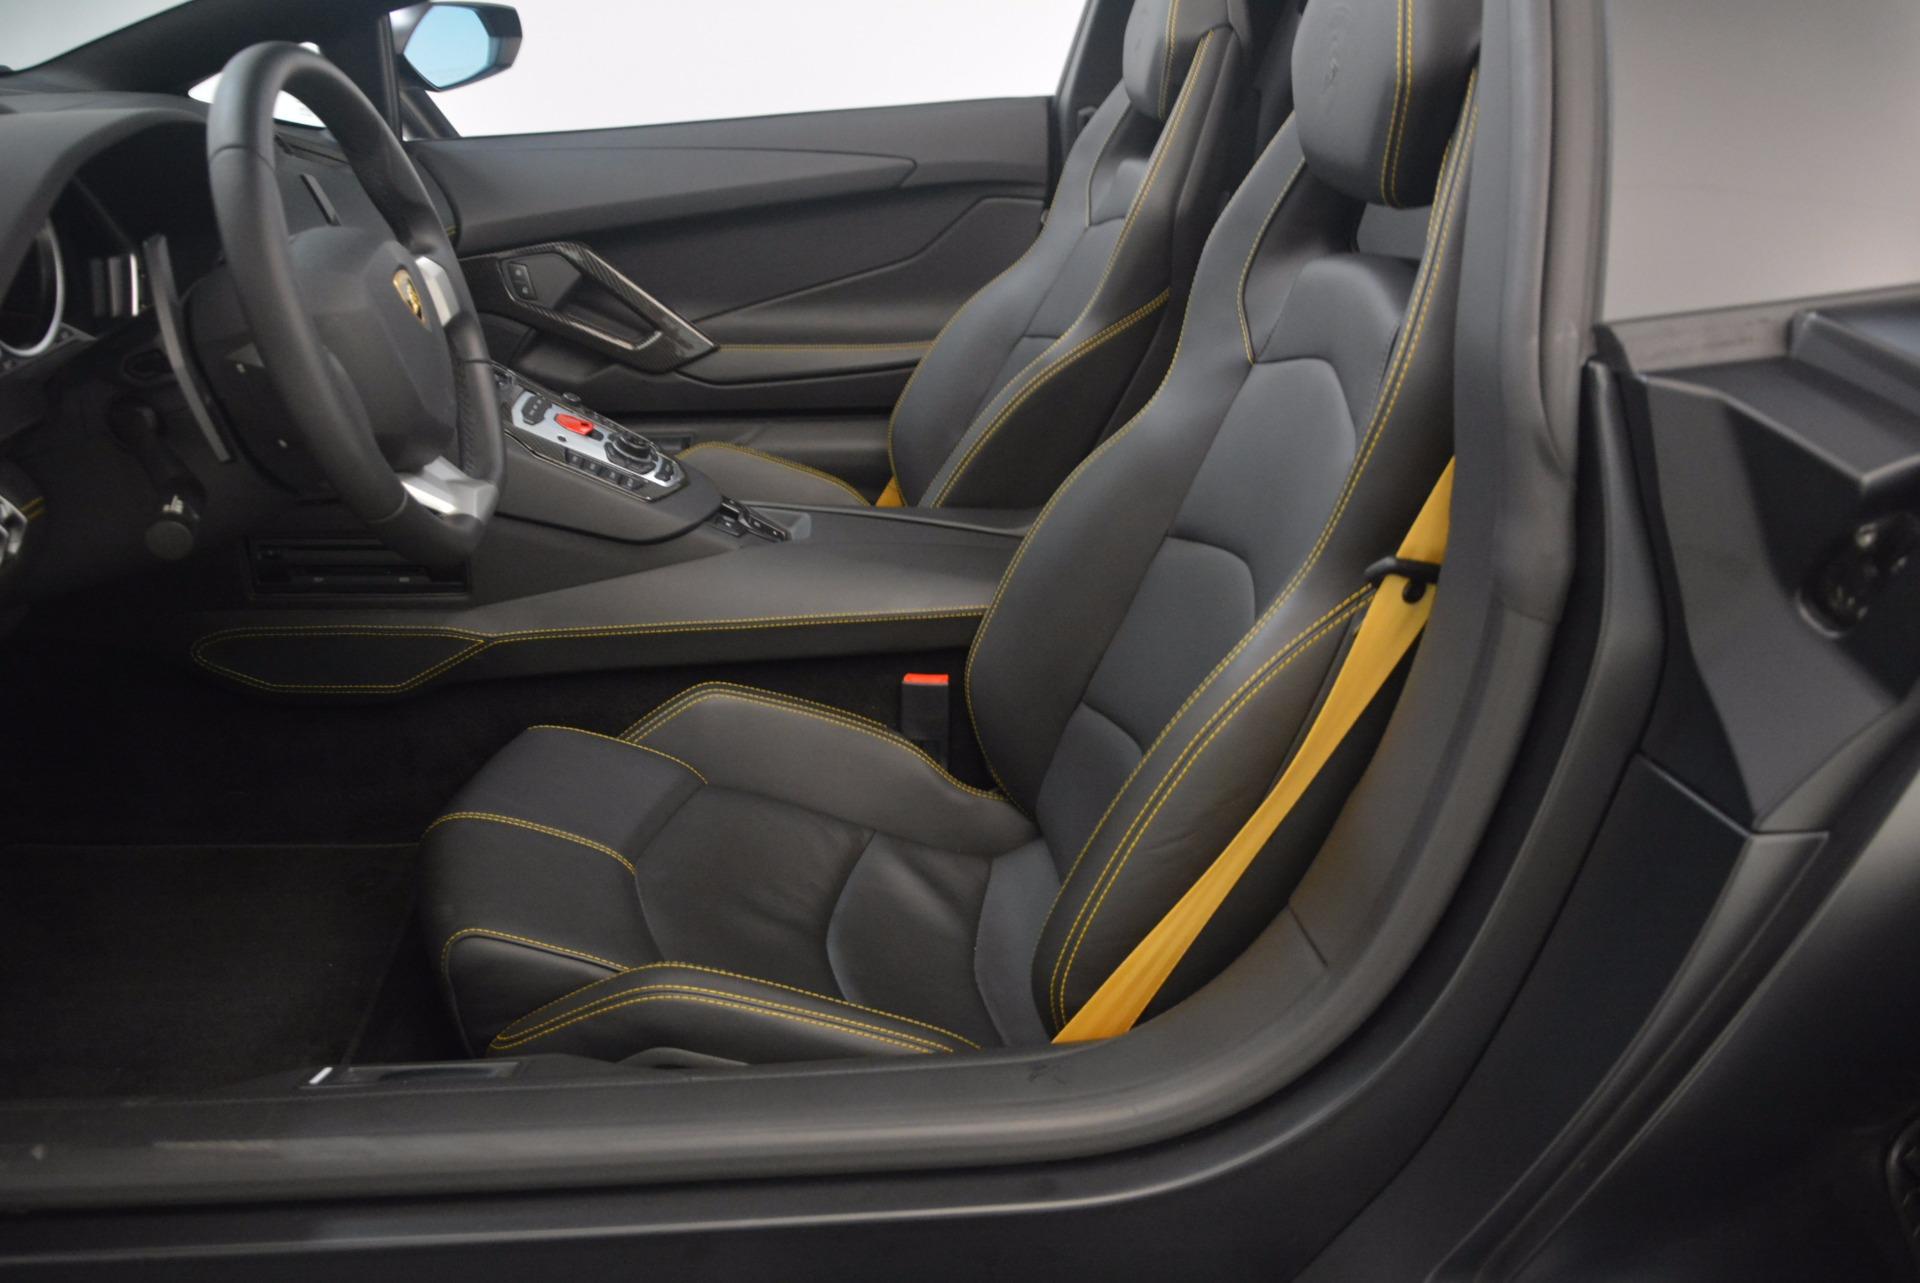 Used 2015 Lamborghini Aventador LP 700-4 For Sale In Westport, CT 1217_p24